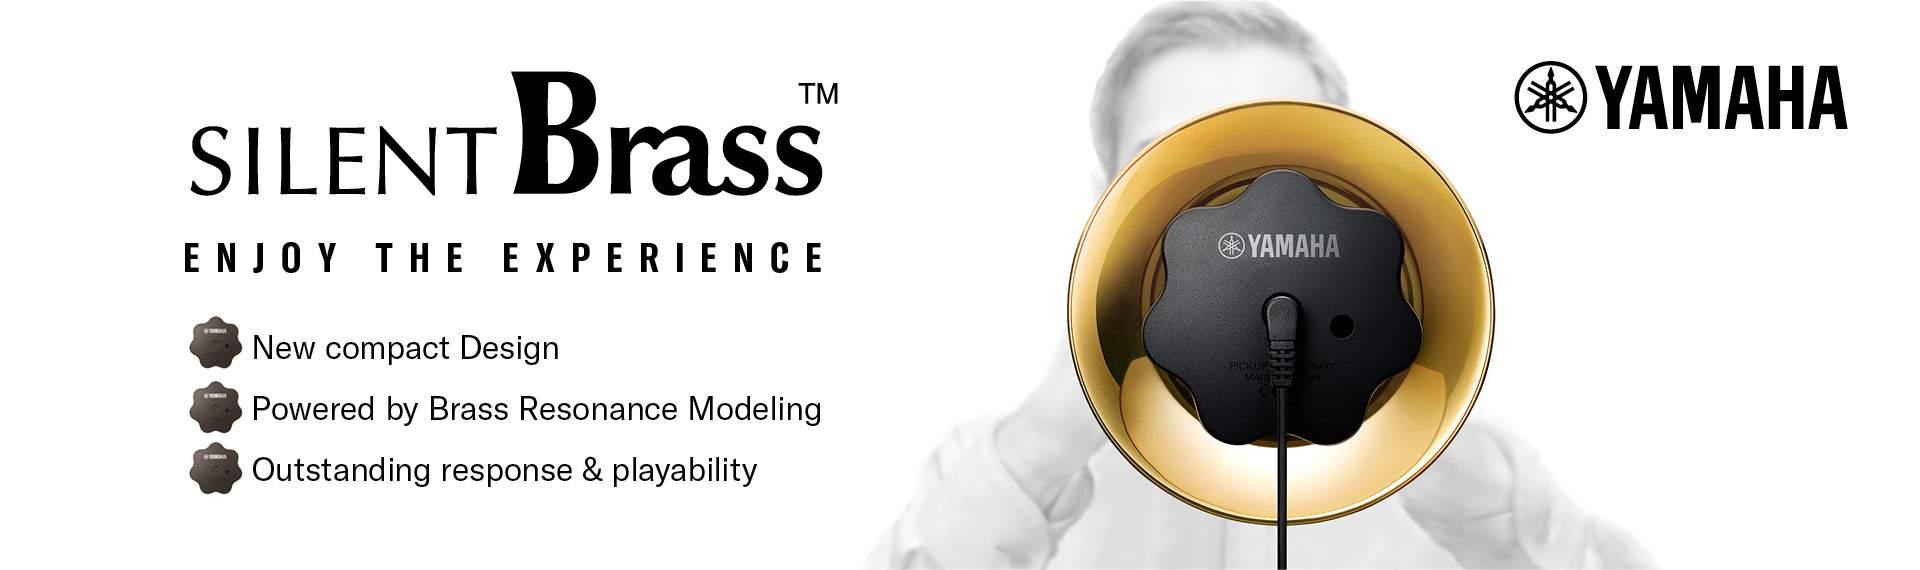 Yamaha Silent Brass Mutes